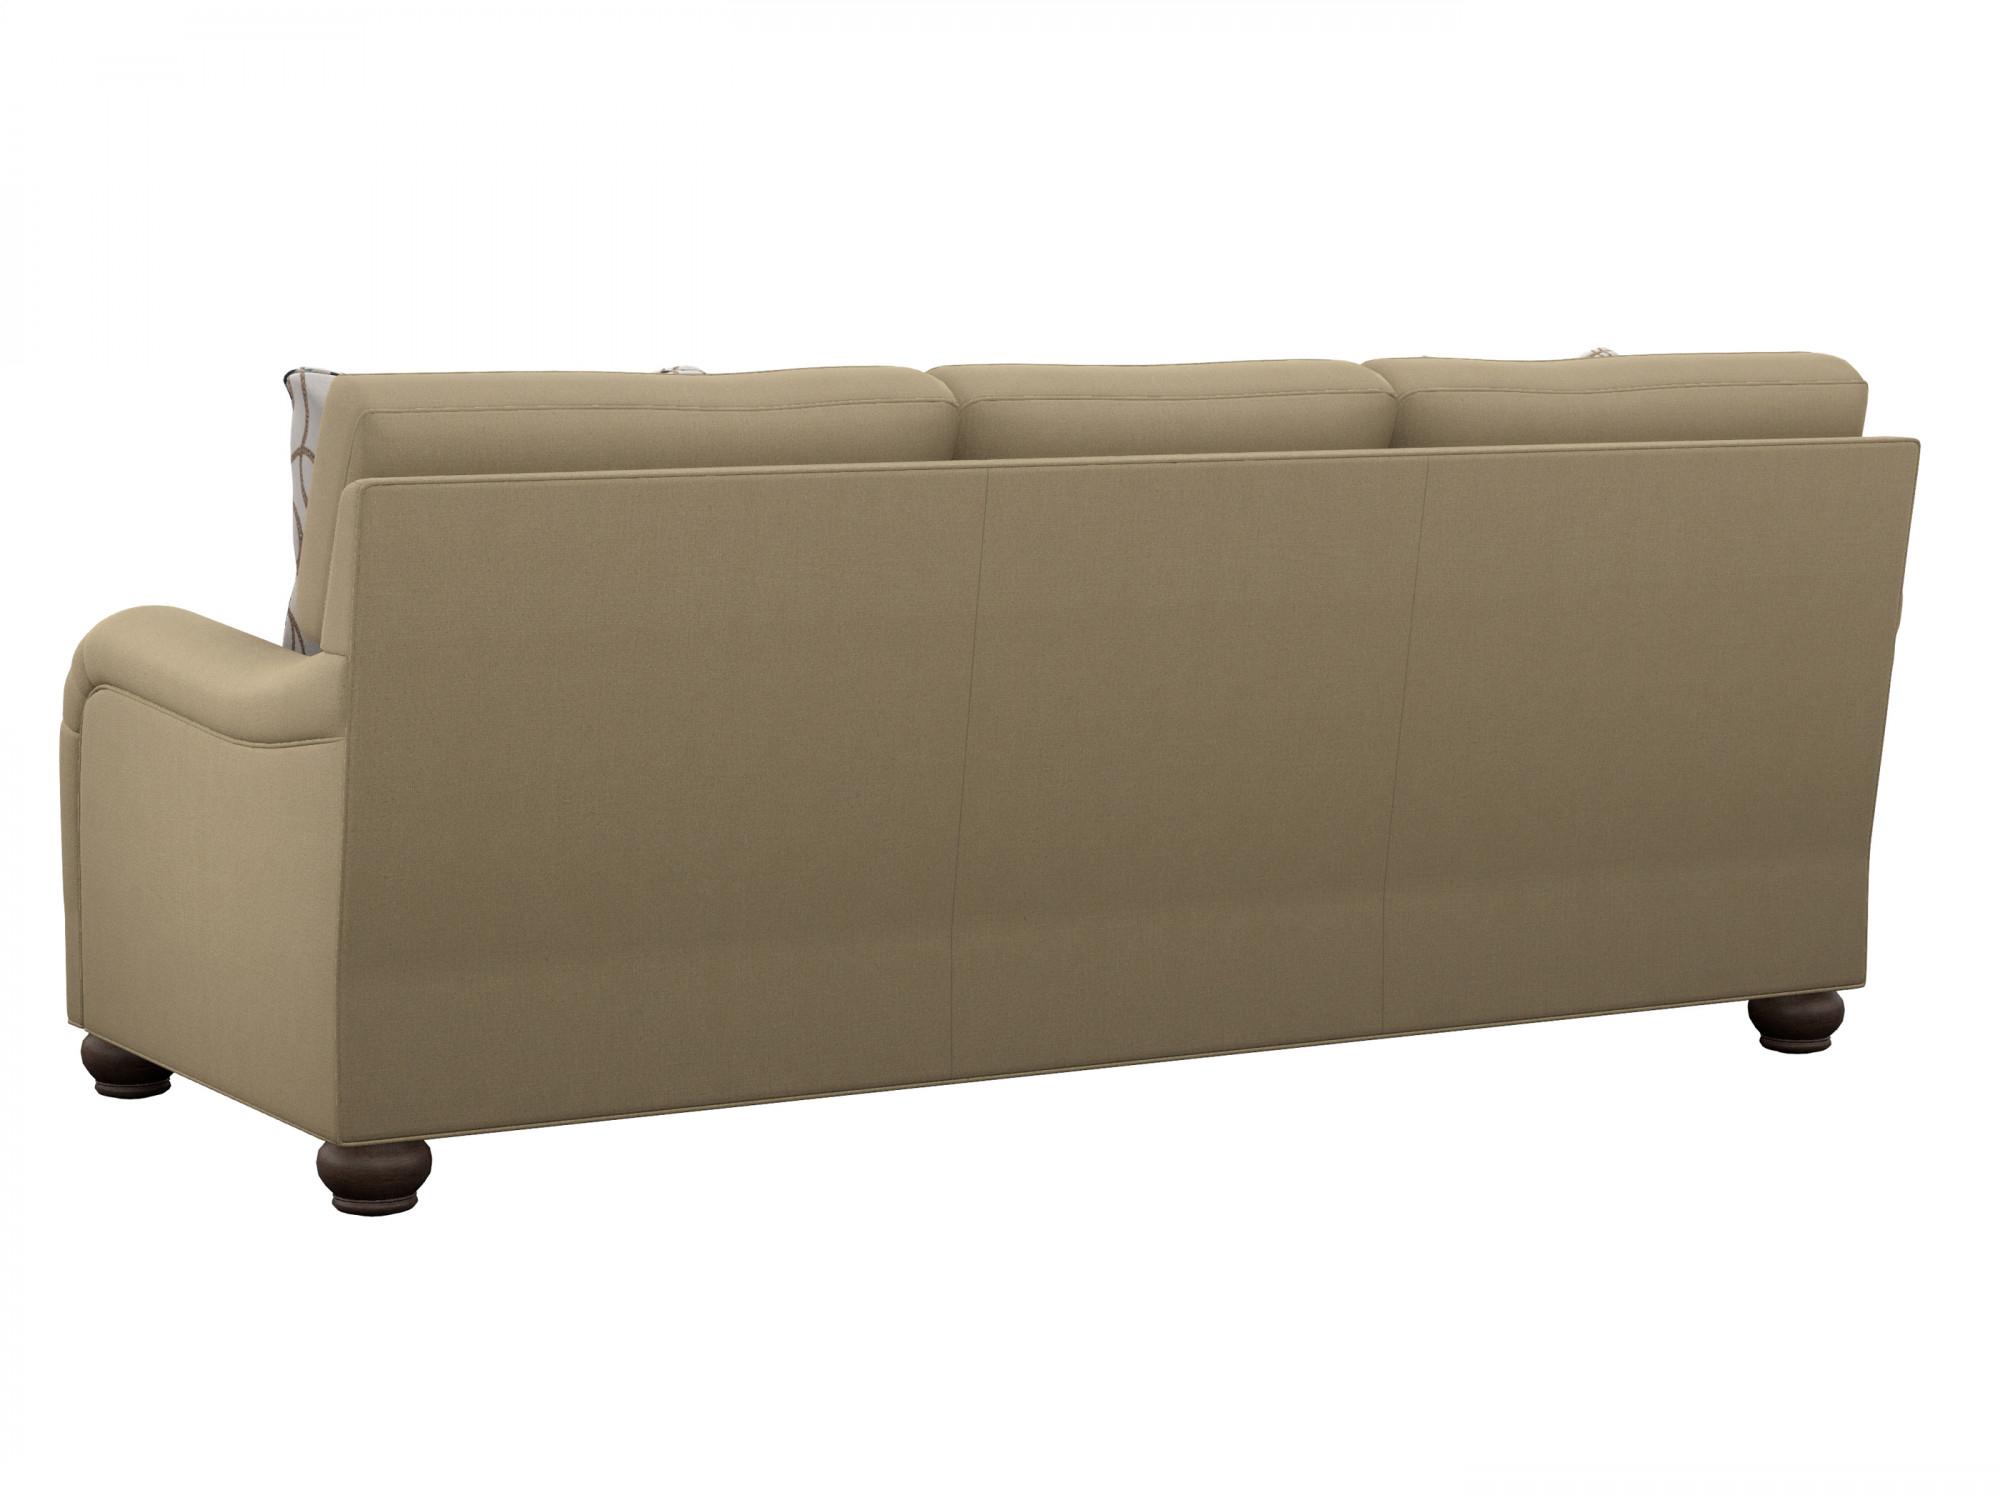 Bristol Sofa For Bristol Sofas (View 11 of 15)